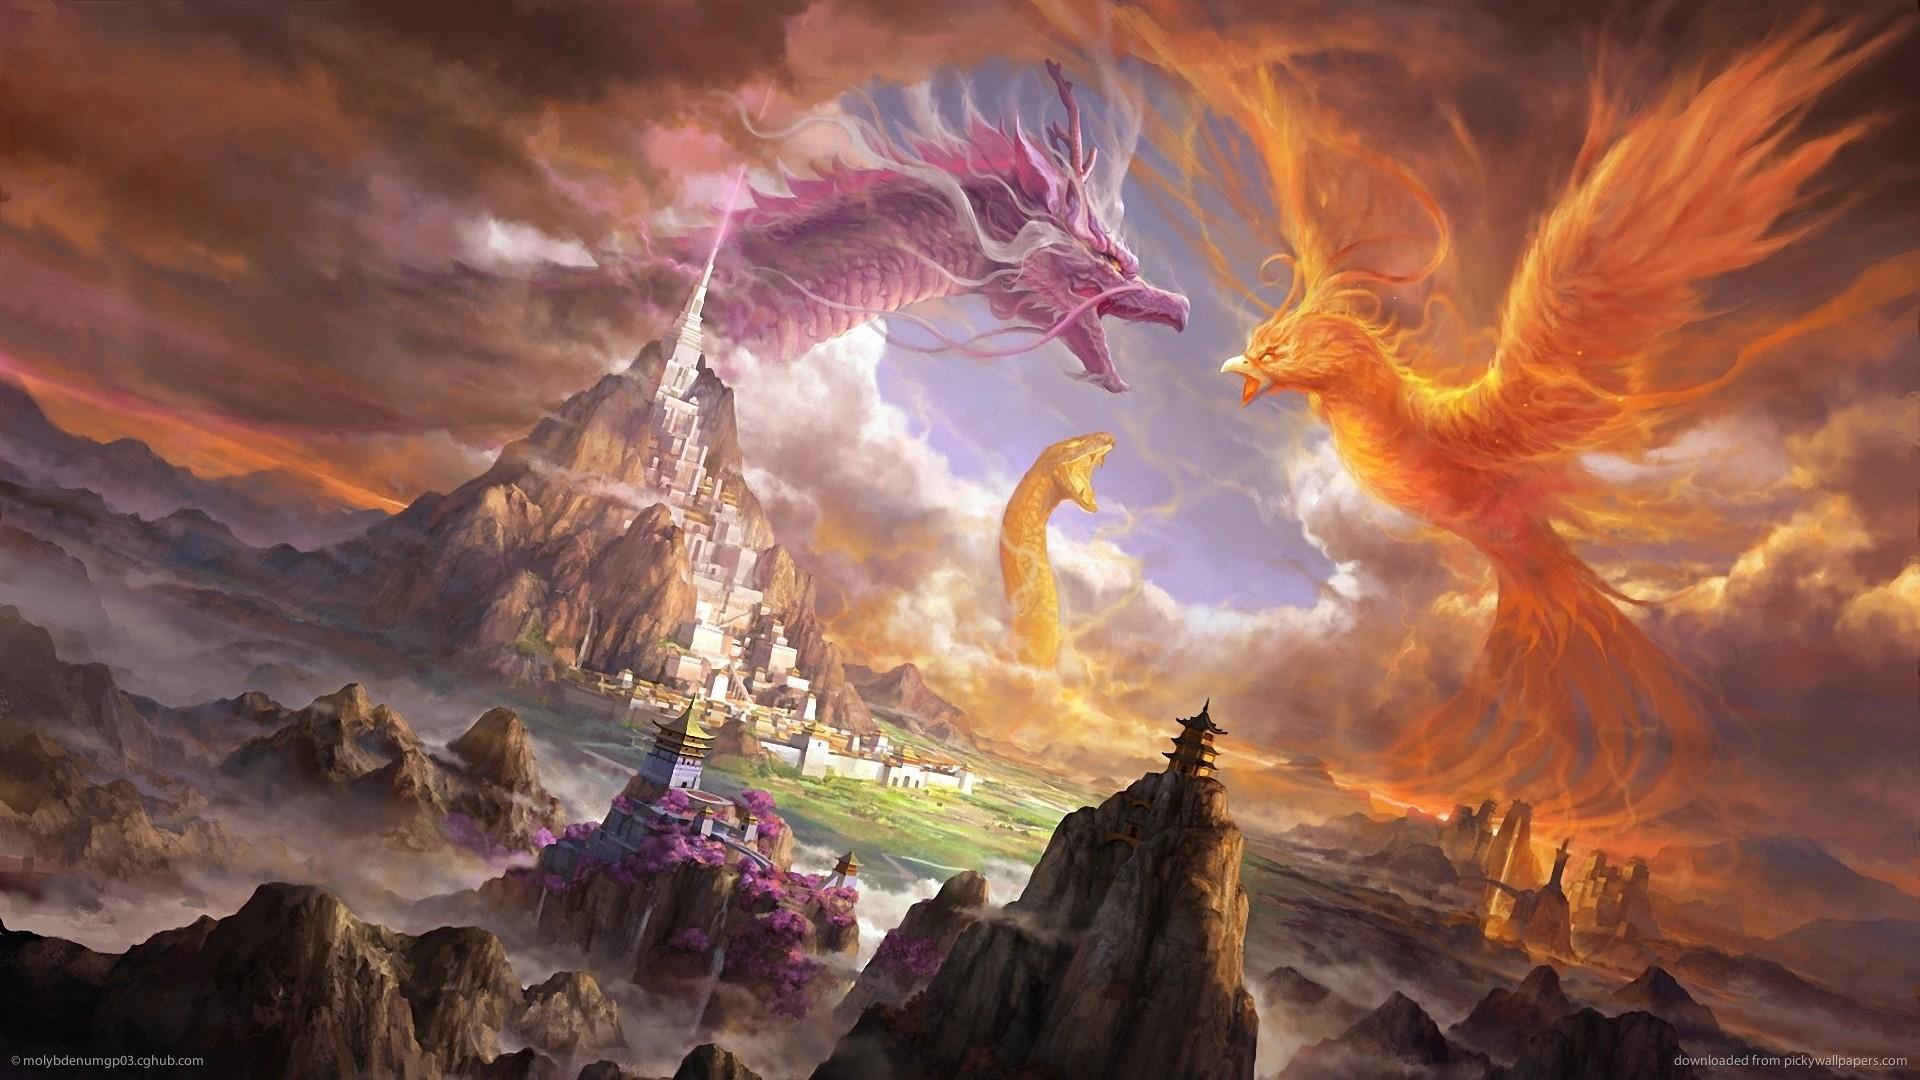 Res: 1920x1080, ... monster, dragon,fantasy, pheonix, asian, oriental, art, landscapes,  amazing, digital art, battle, tablet backgrounds castle,download Wallpaper  HD